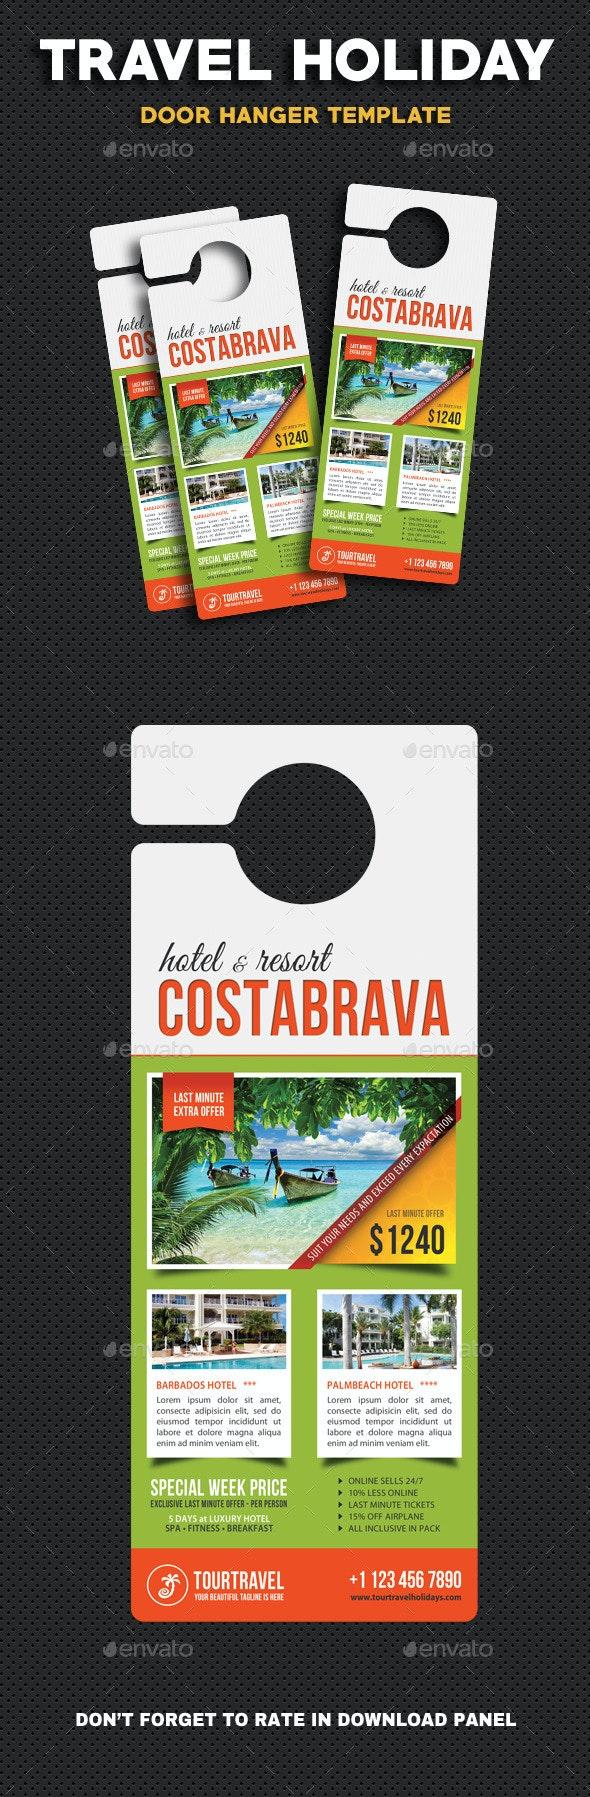 Travel Holiday Door Hanger V4 - Miscellaneous Print Templates